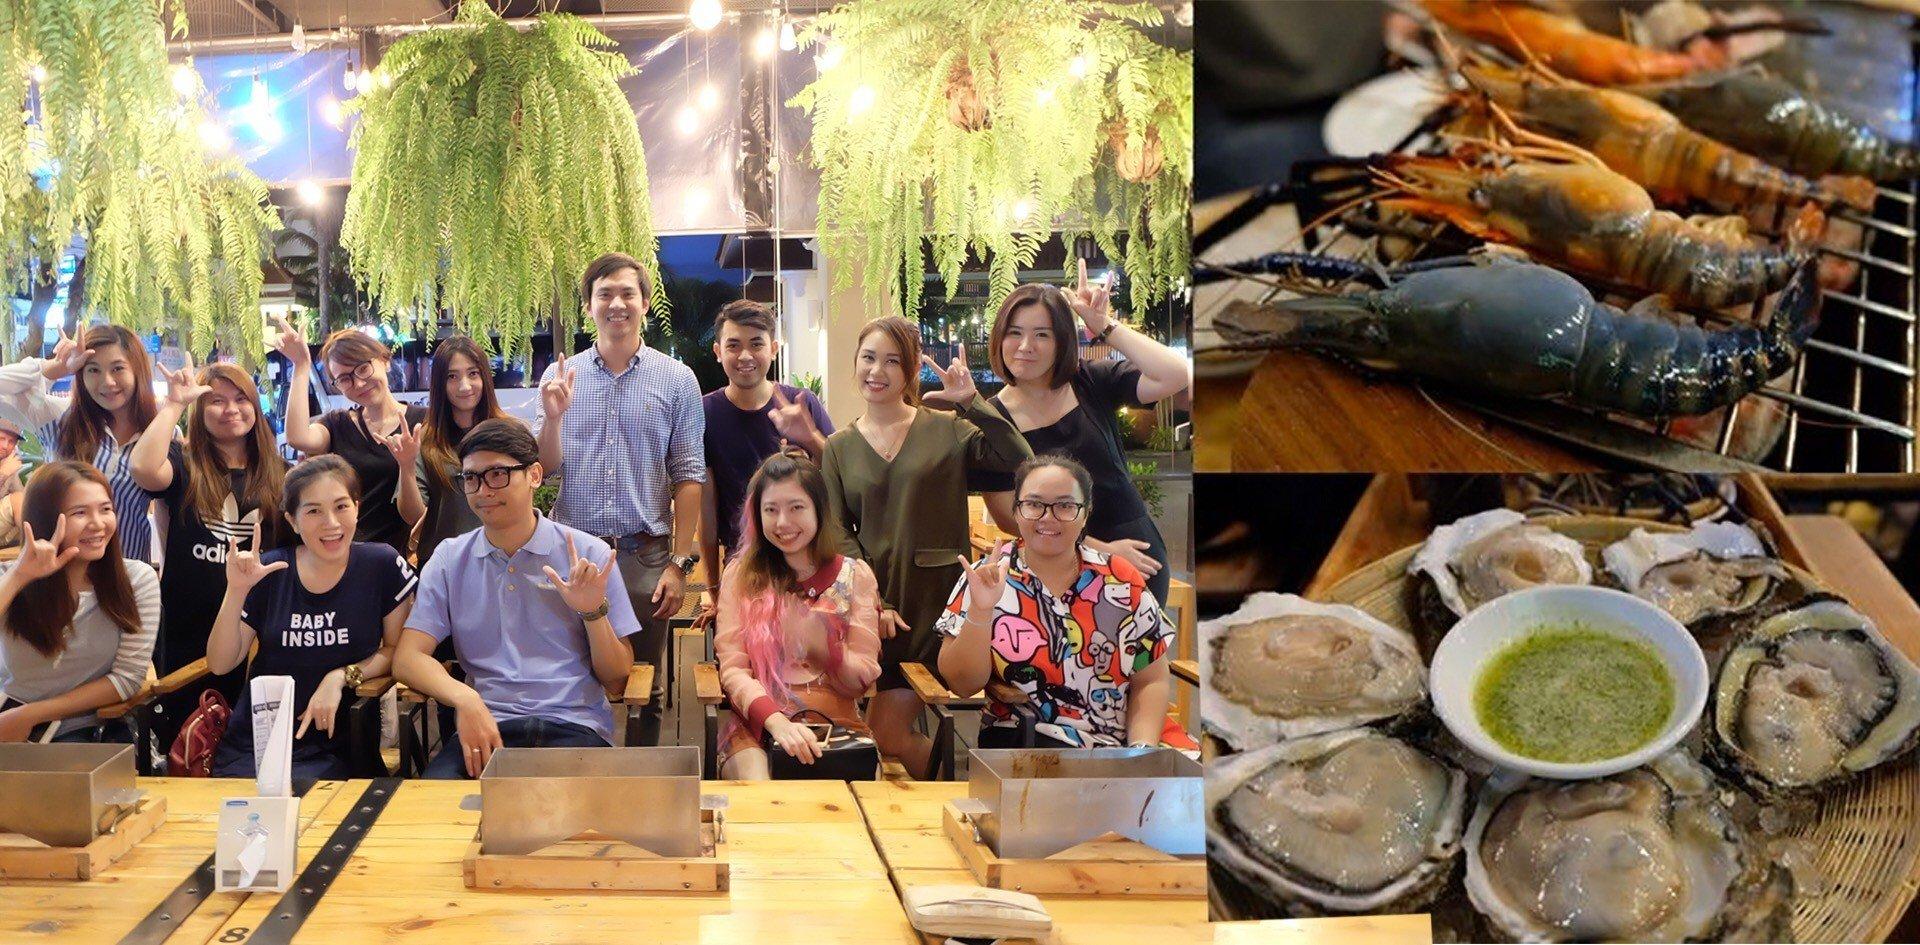 Wongnai Chonburi Top User Party #17  ที่ Bridge Over Water พัทยาสาย 3